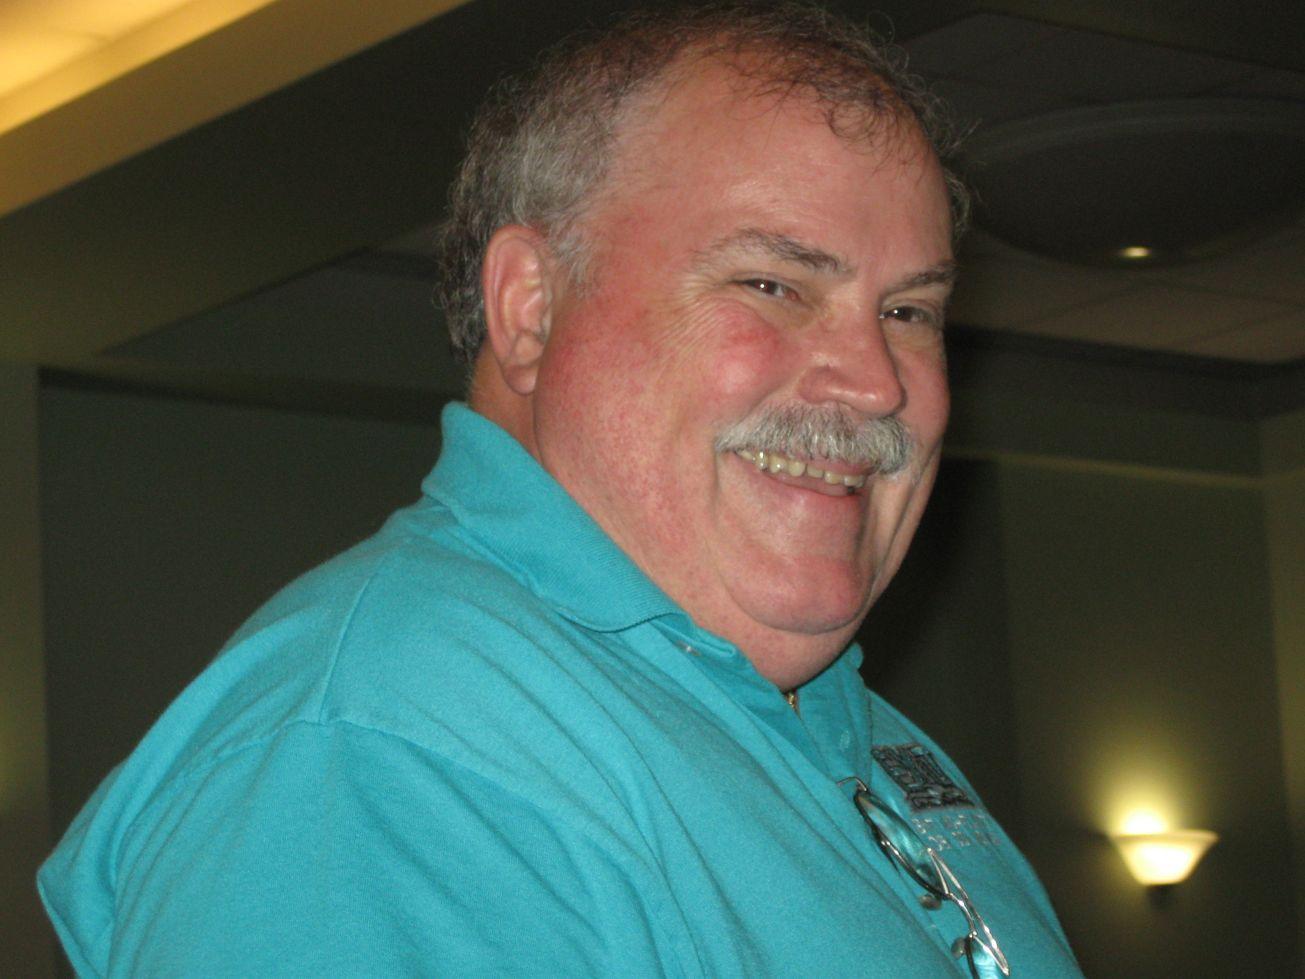 Rick MdDaniel